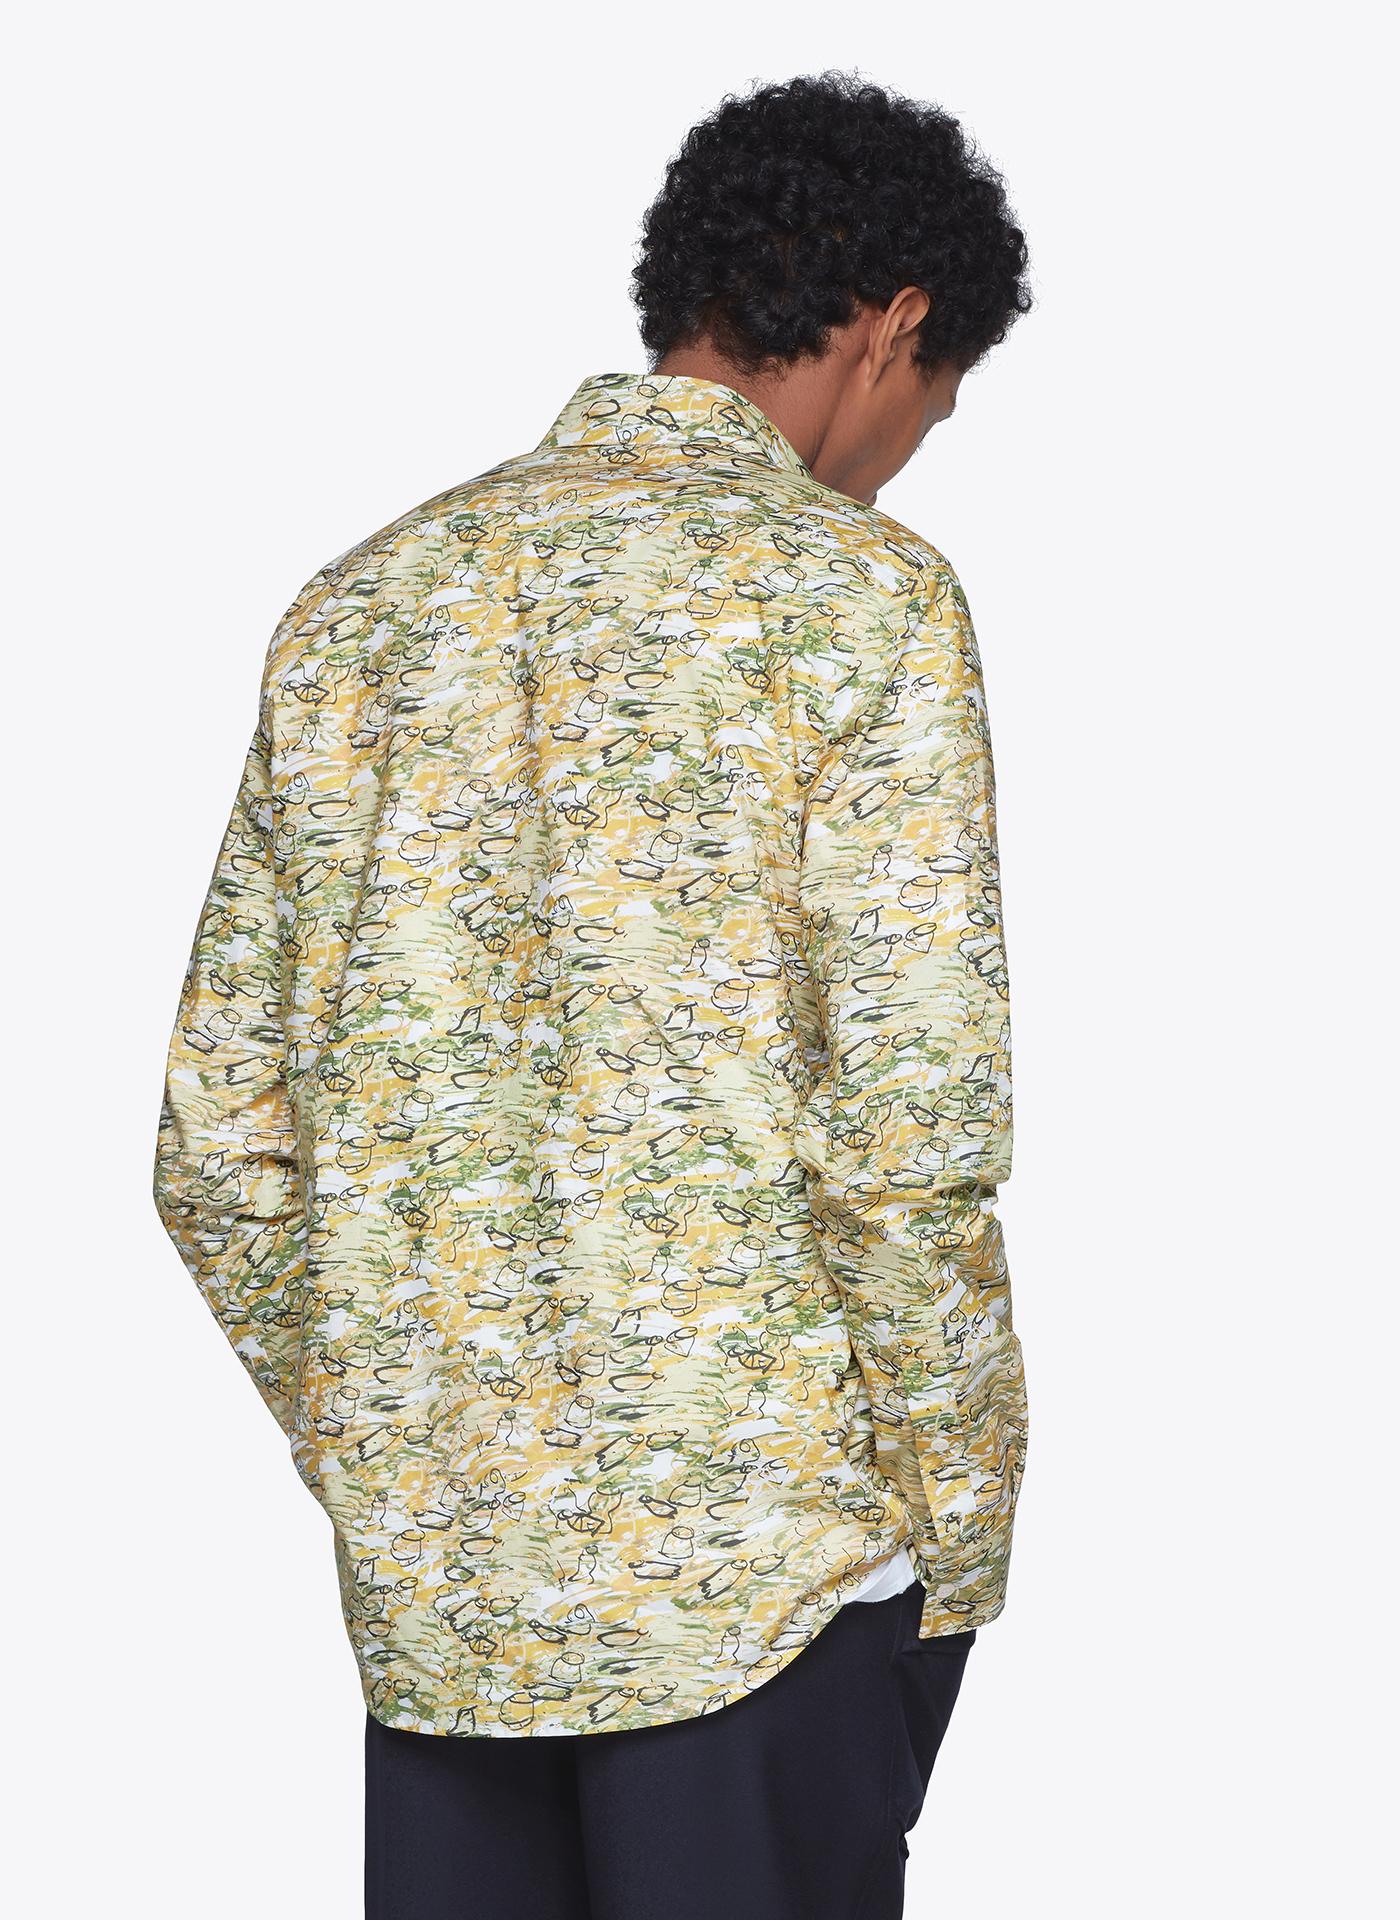 menswear model wearing light floral shirt